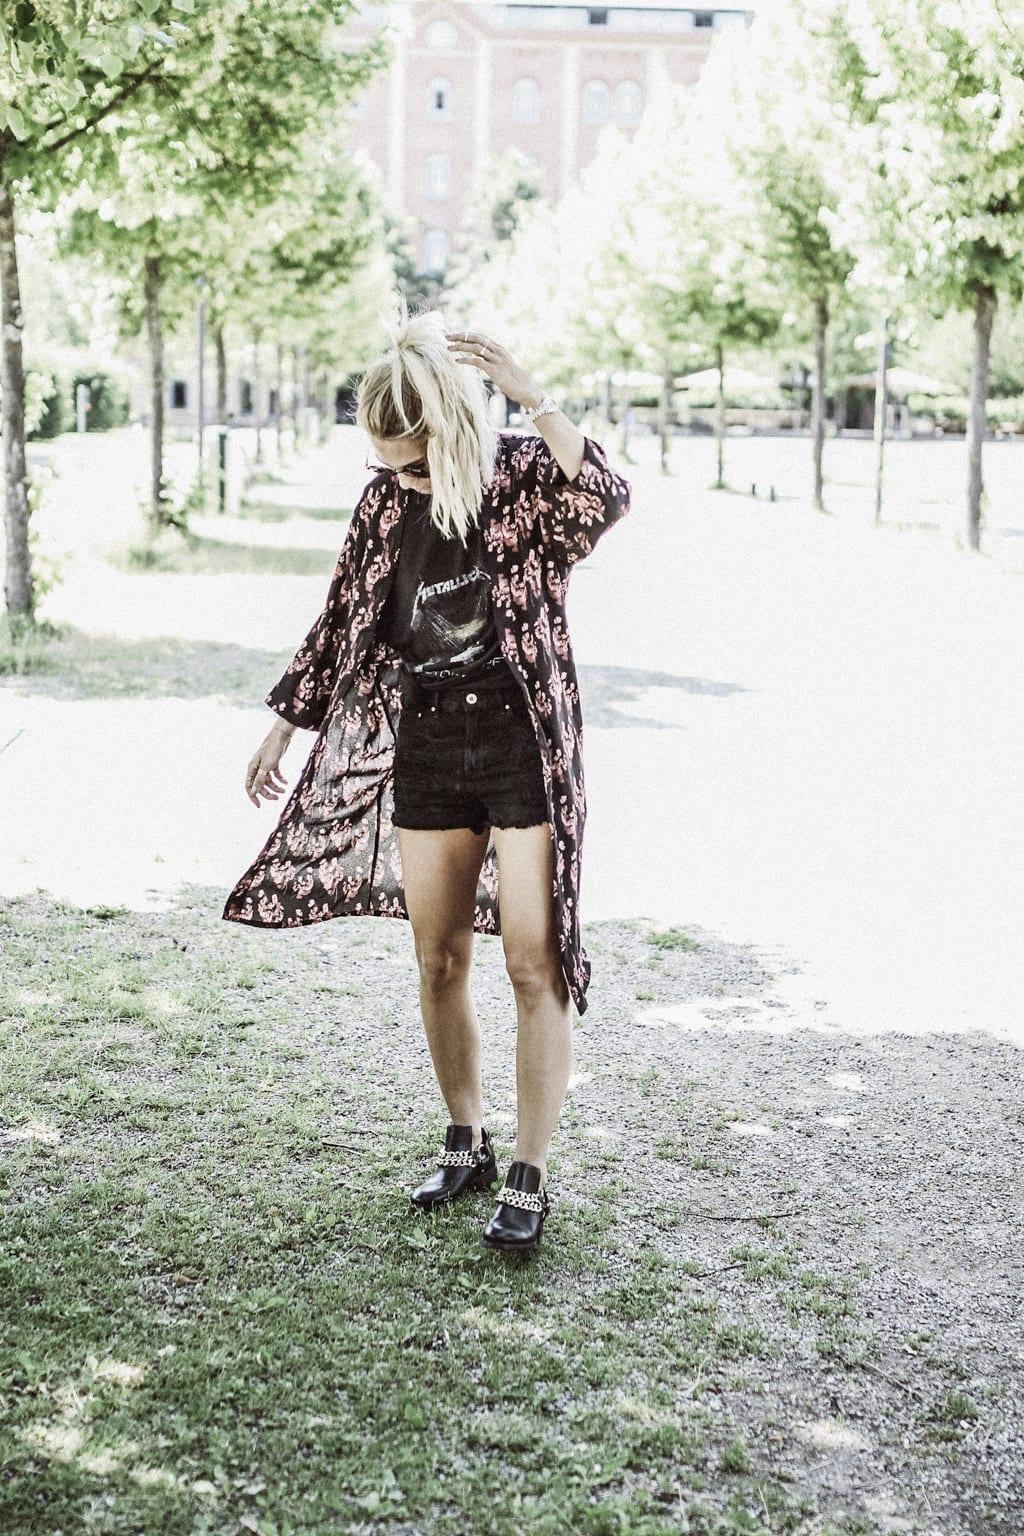 CK-1606_salzburg-fashion-street-style-look-magazine-karin-kaswurm-electric-love-2016-festival-8735